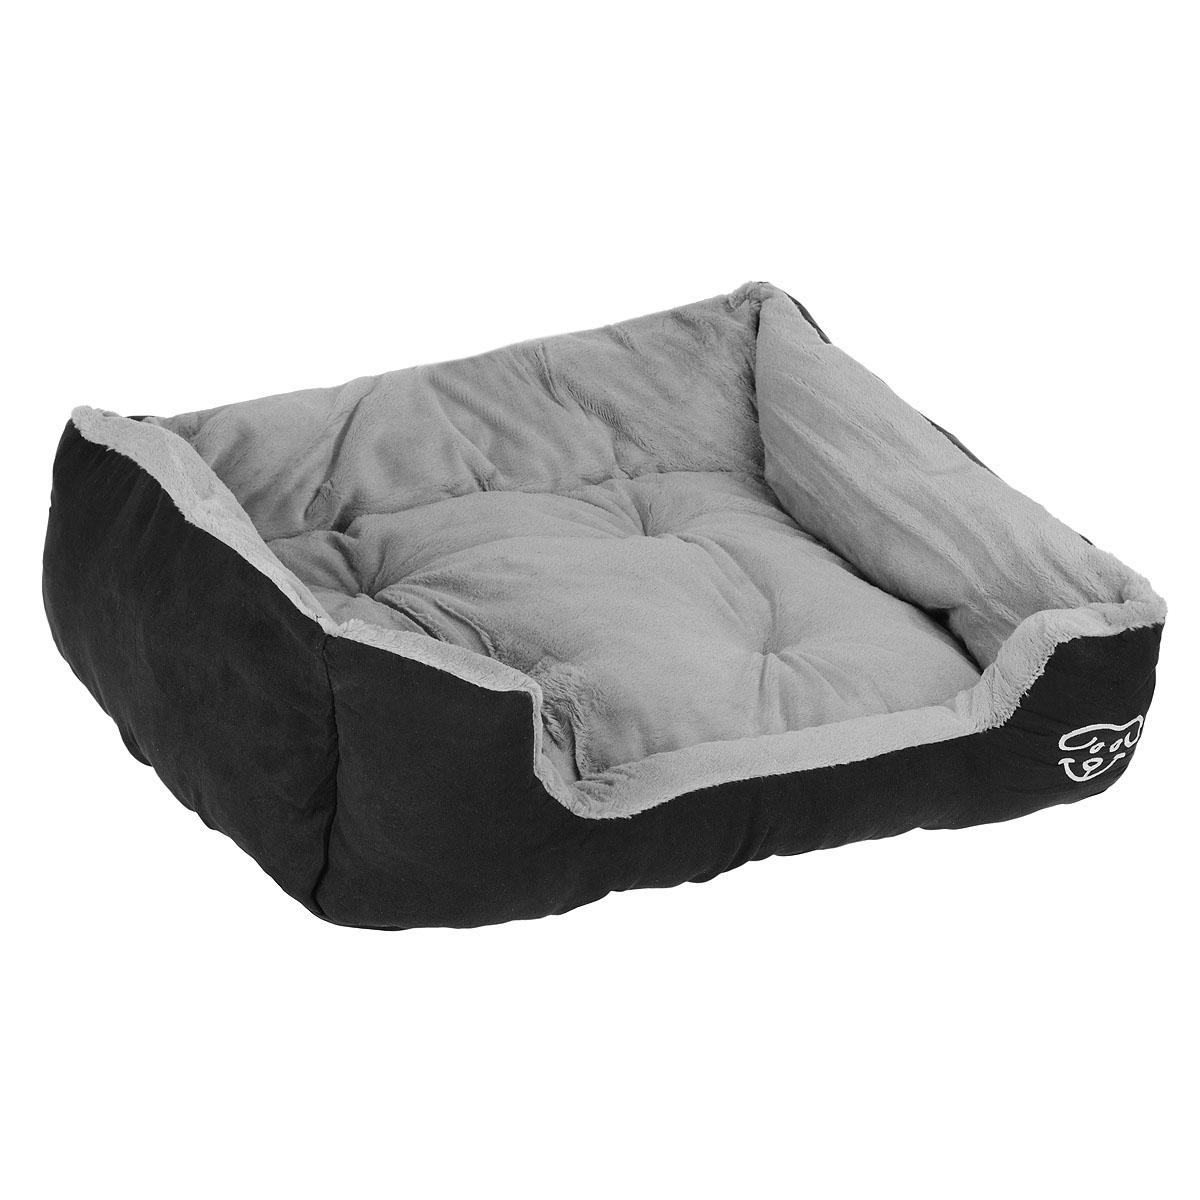 Лежак для собак I.P.T.S. Doomba, 65 см х 60 см х 20 см лежак дарэлл хантер лось 3 с подушкой 65 48 18см